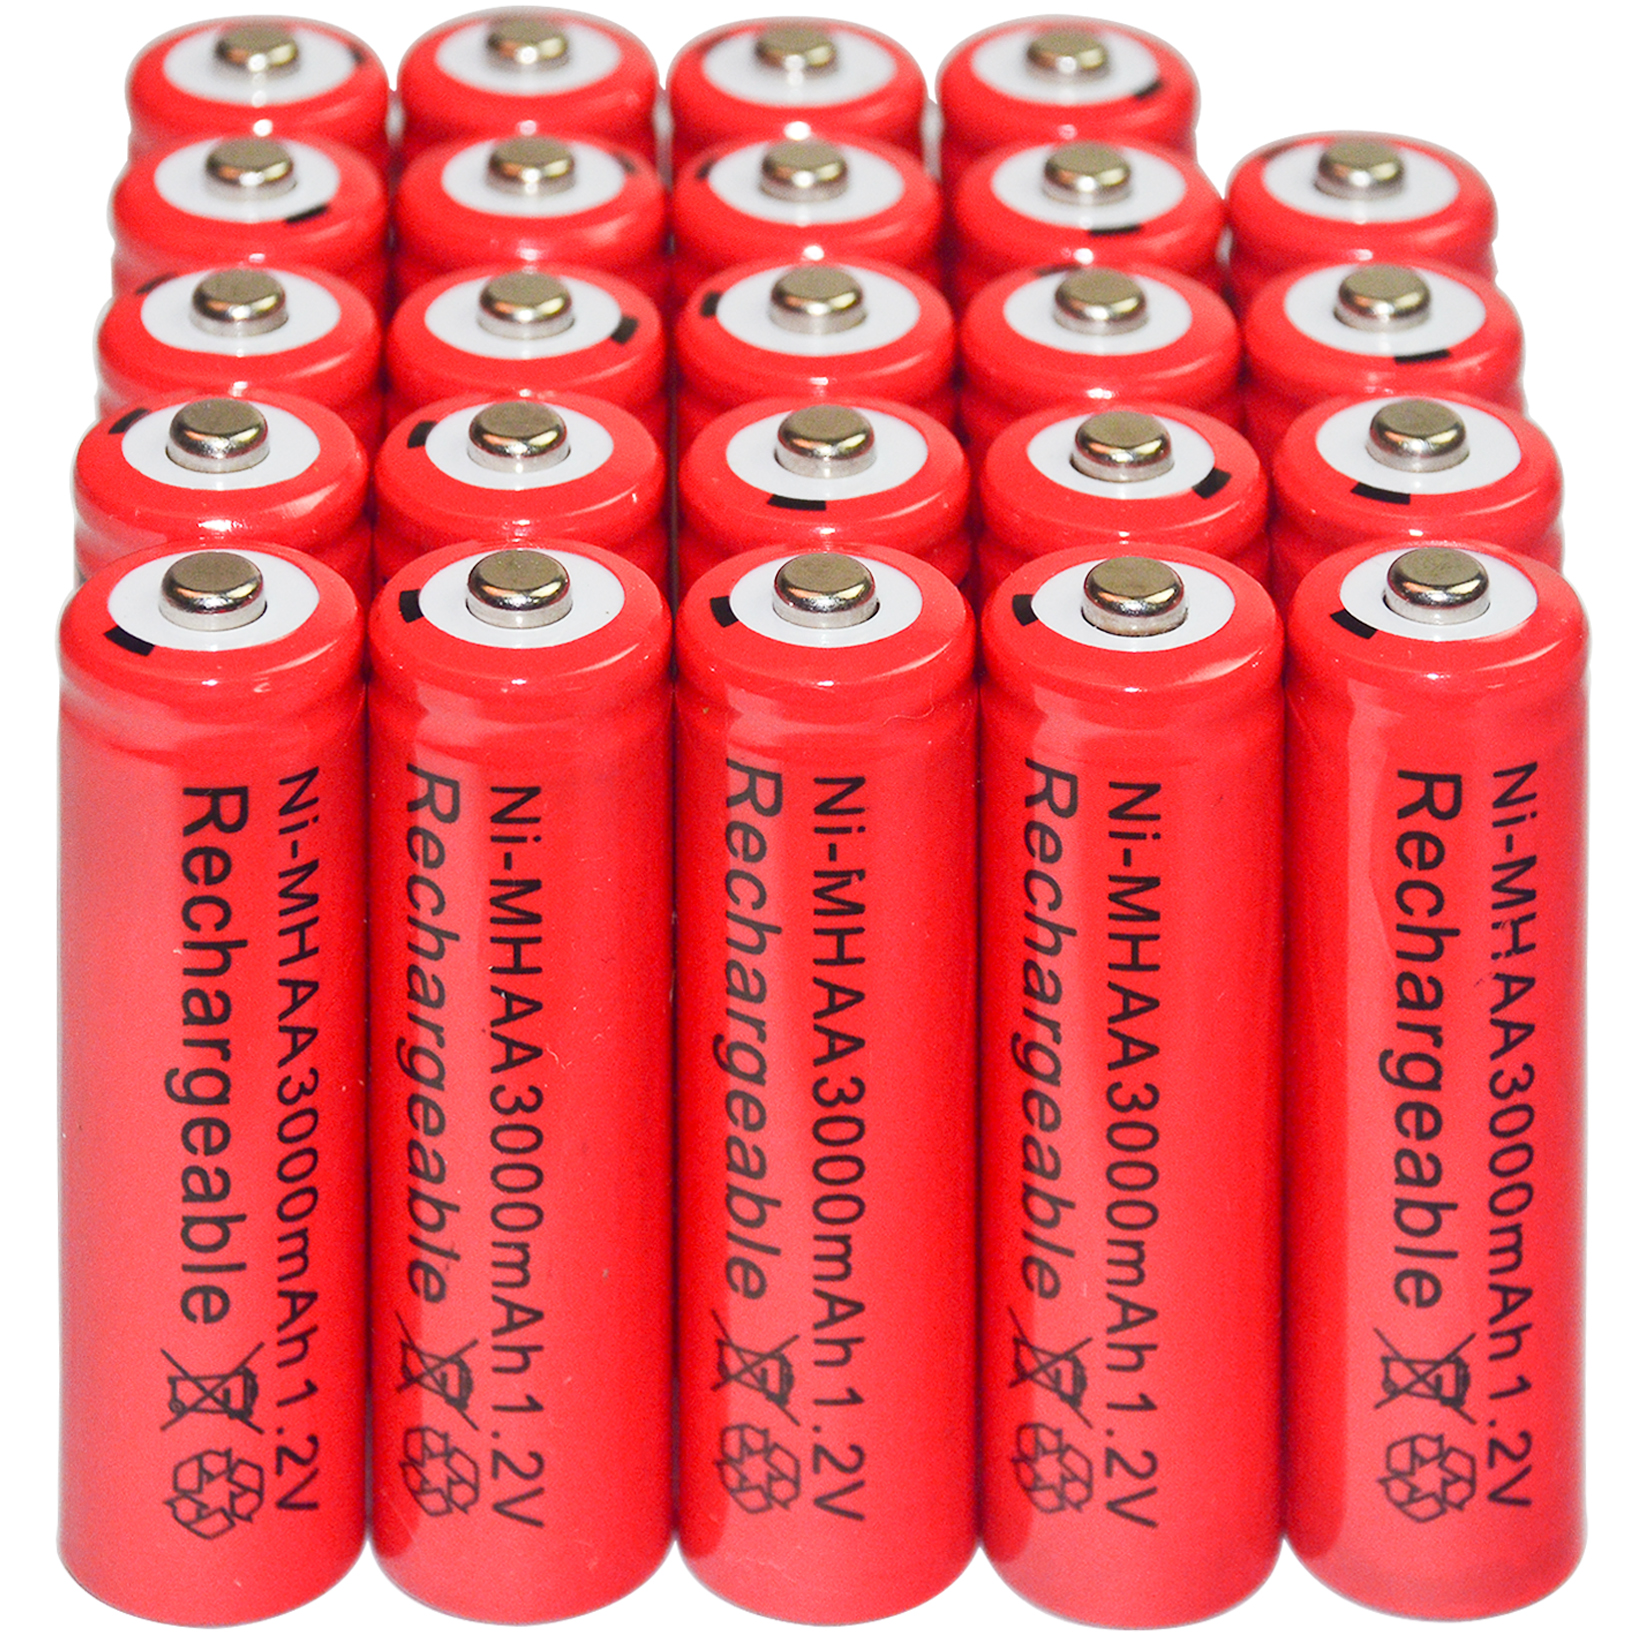 4/8/16/24/32/44 pcs AA Ni-Mh 3000 mAh 1.2 V Bateria Recarregável cor vermelha Despertador MP3 RC Brinquedos lanterna led